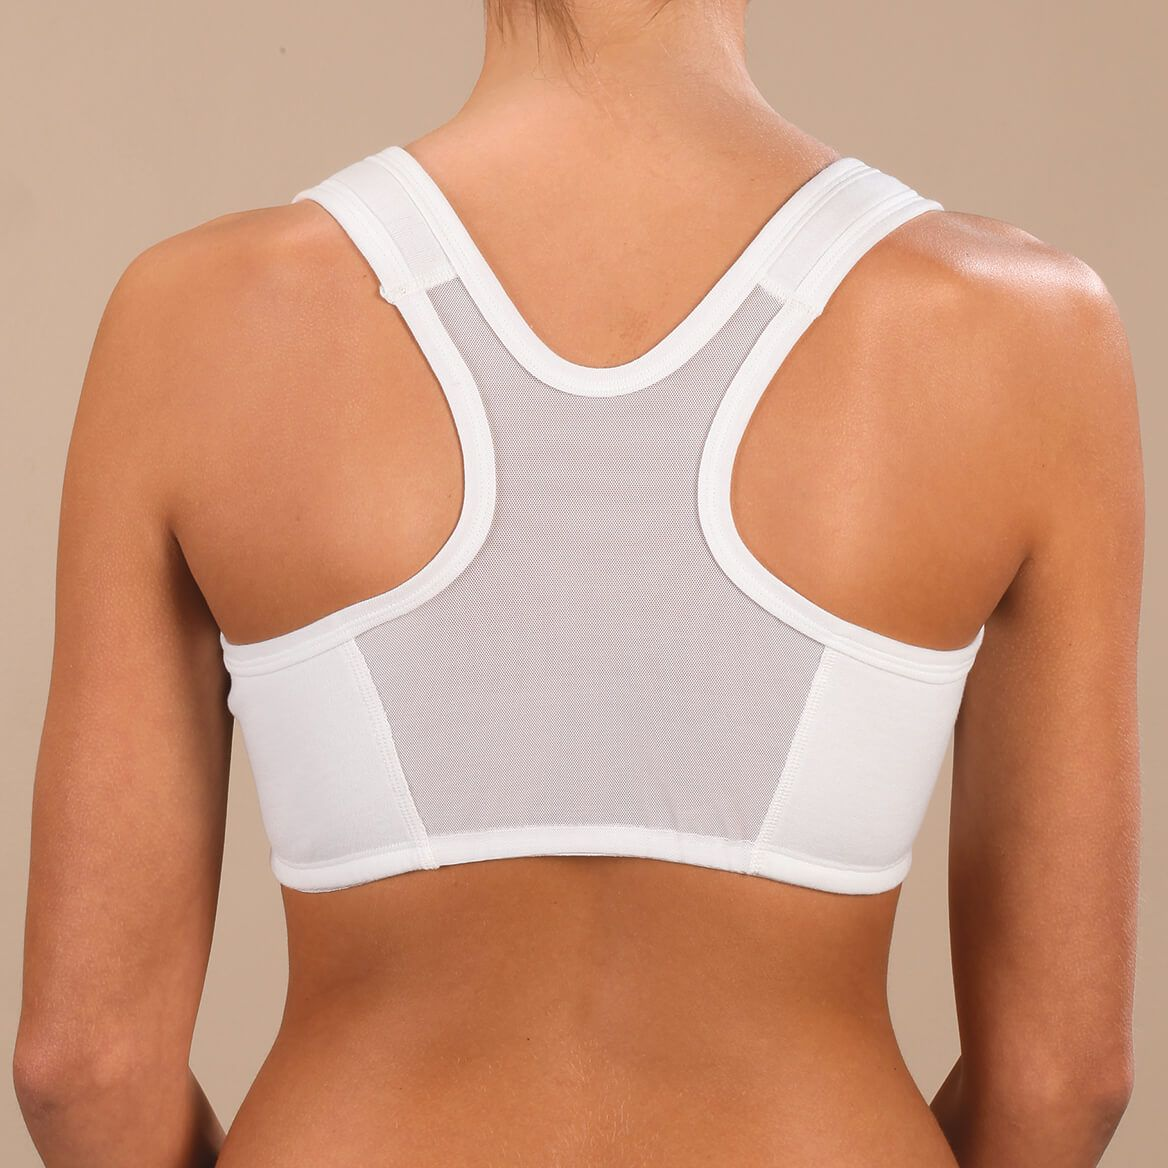 Easy Comforts Style™ Front Zip Mesh Back Bra-354462